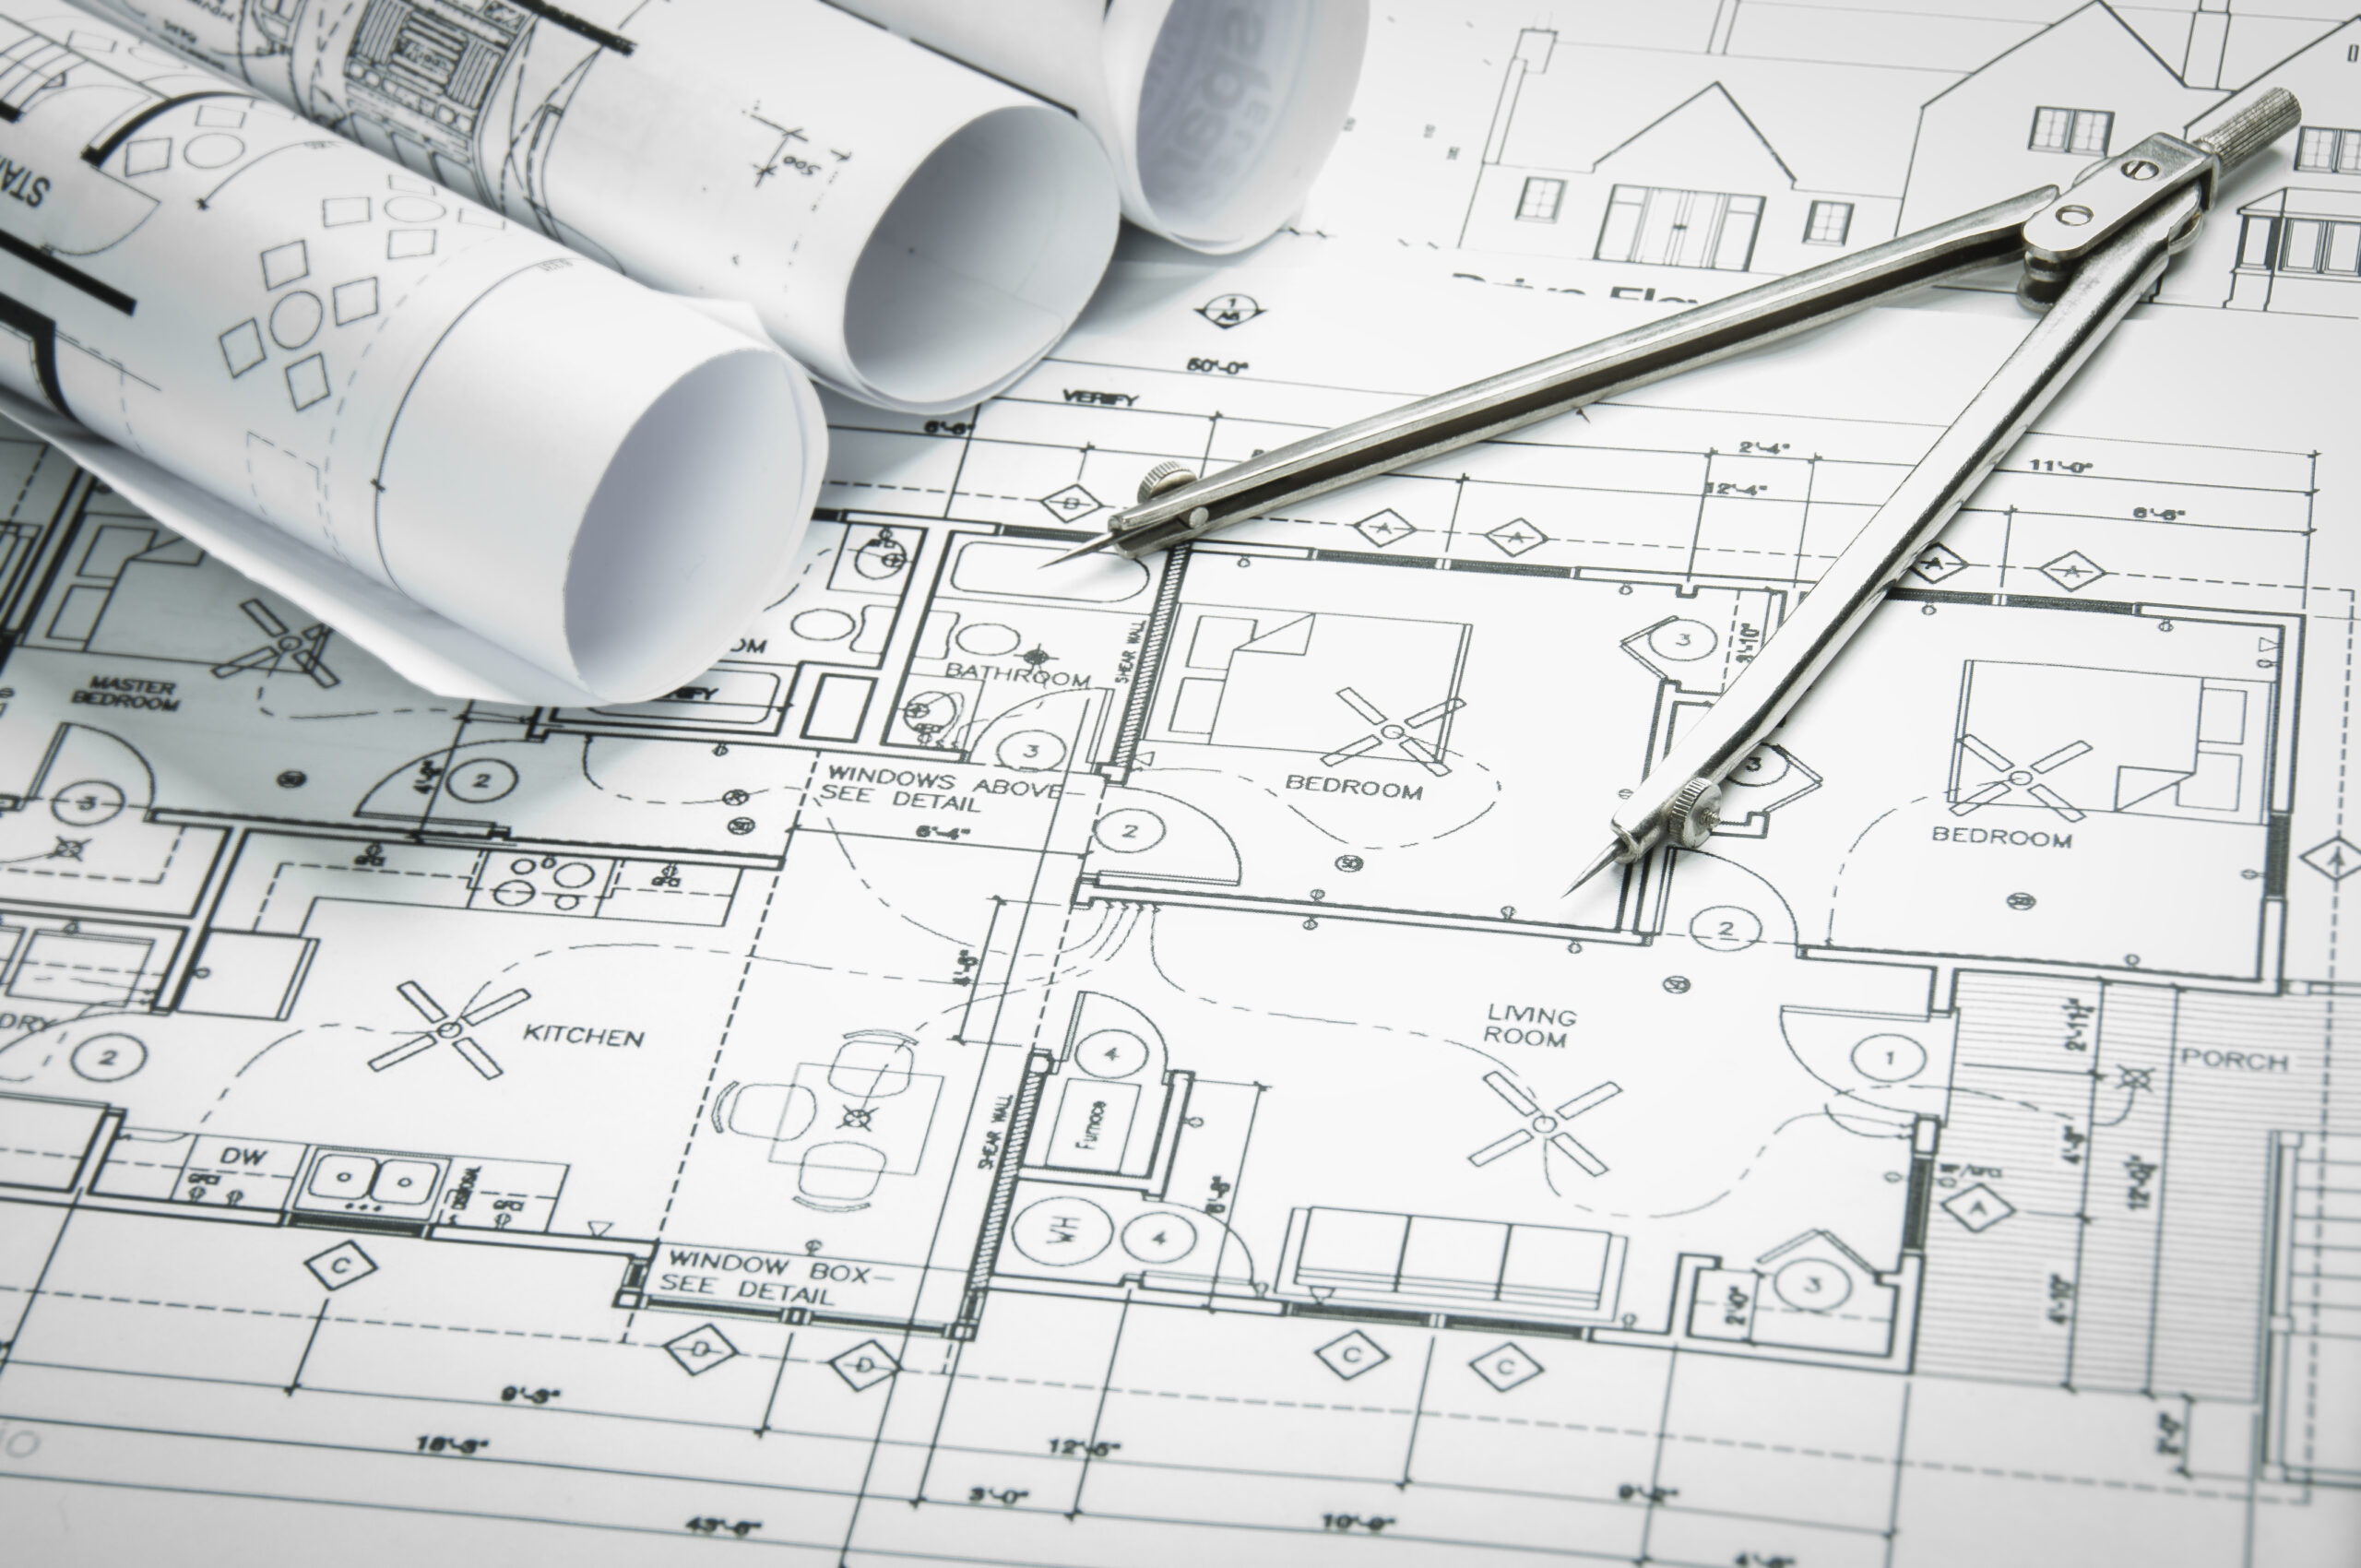 Floorplan blueprint